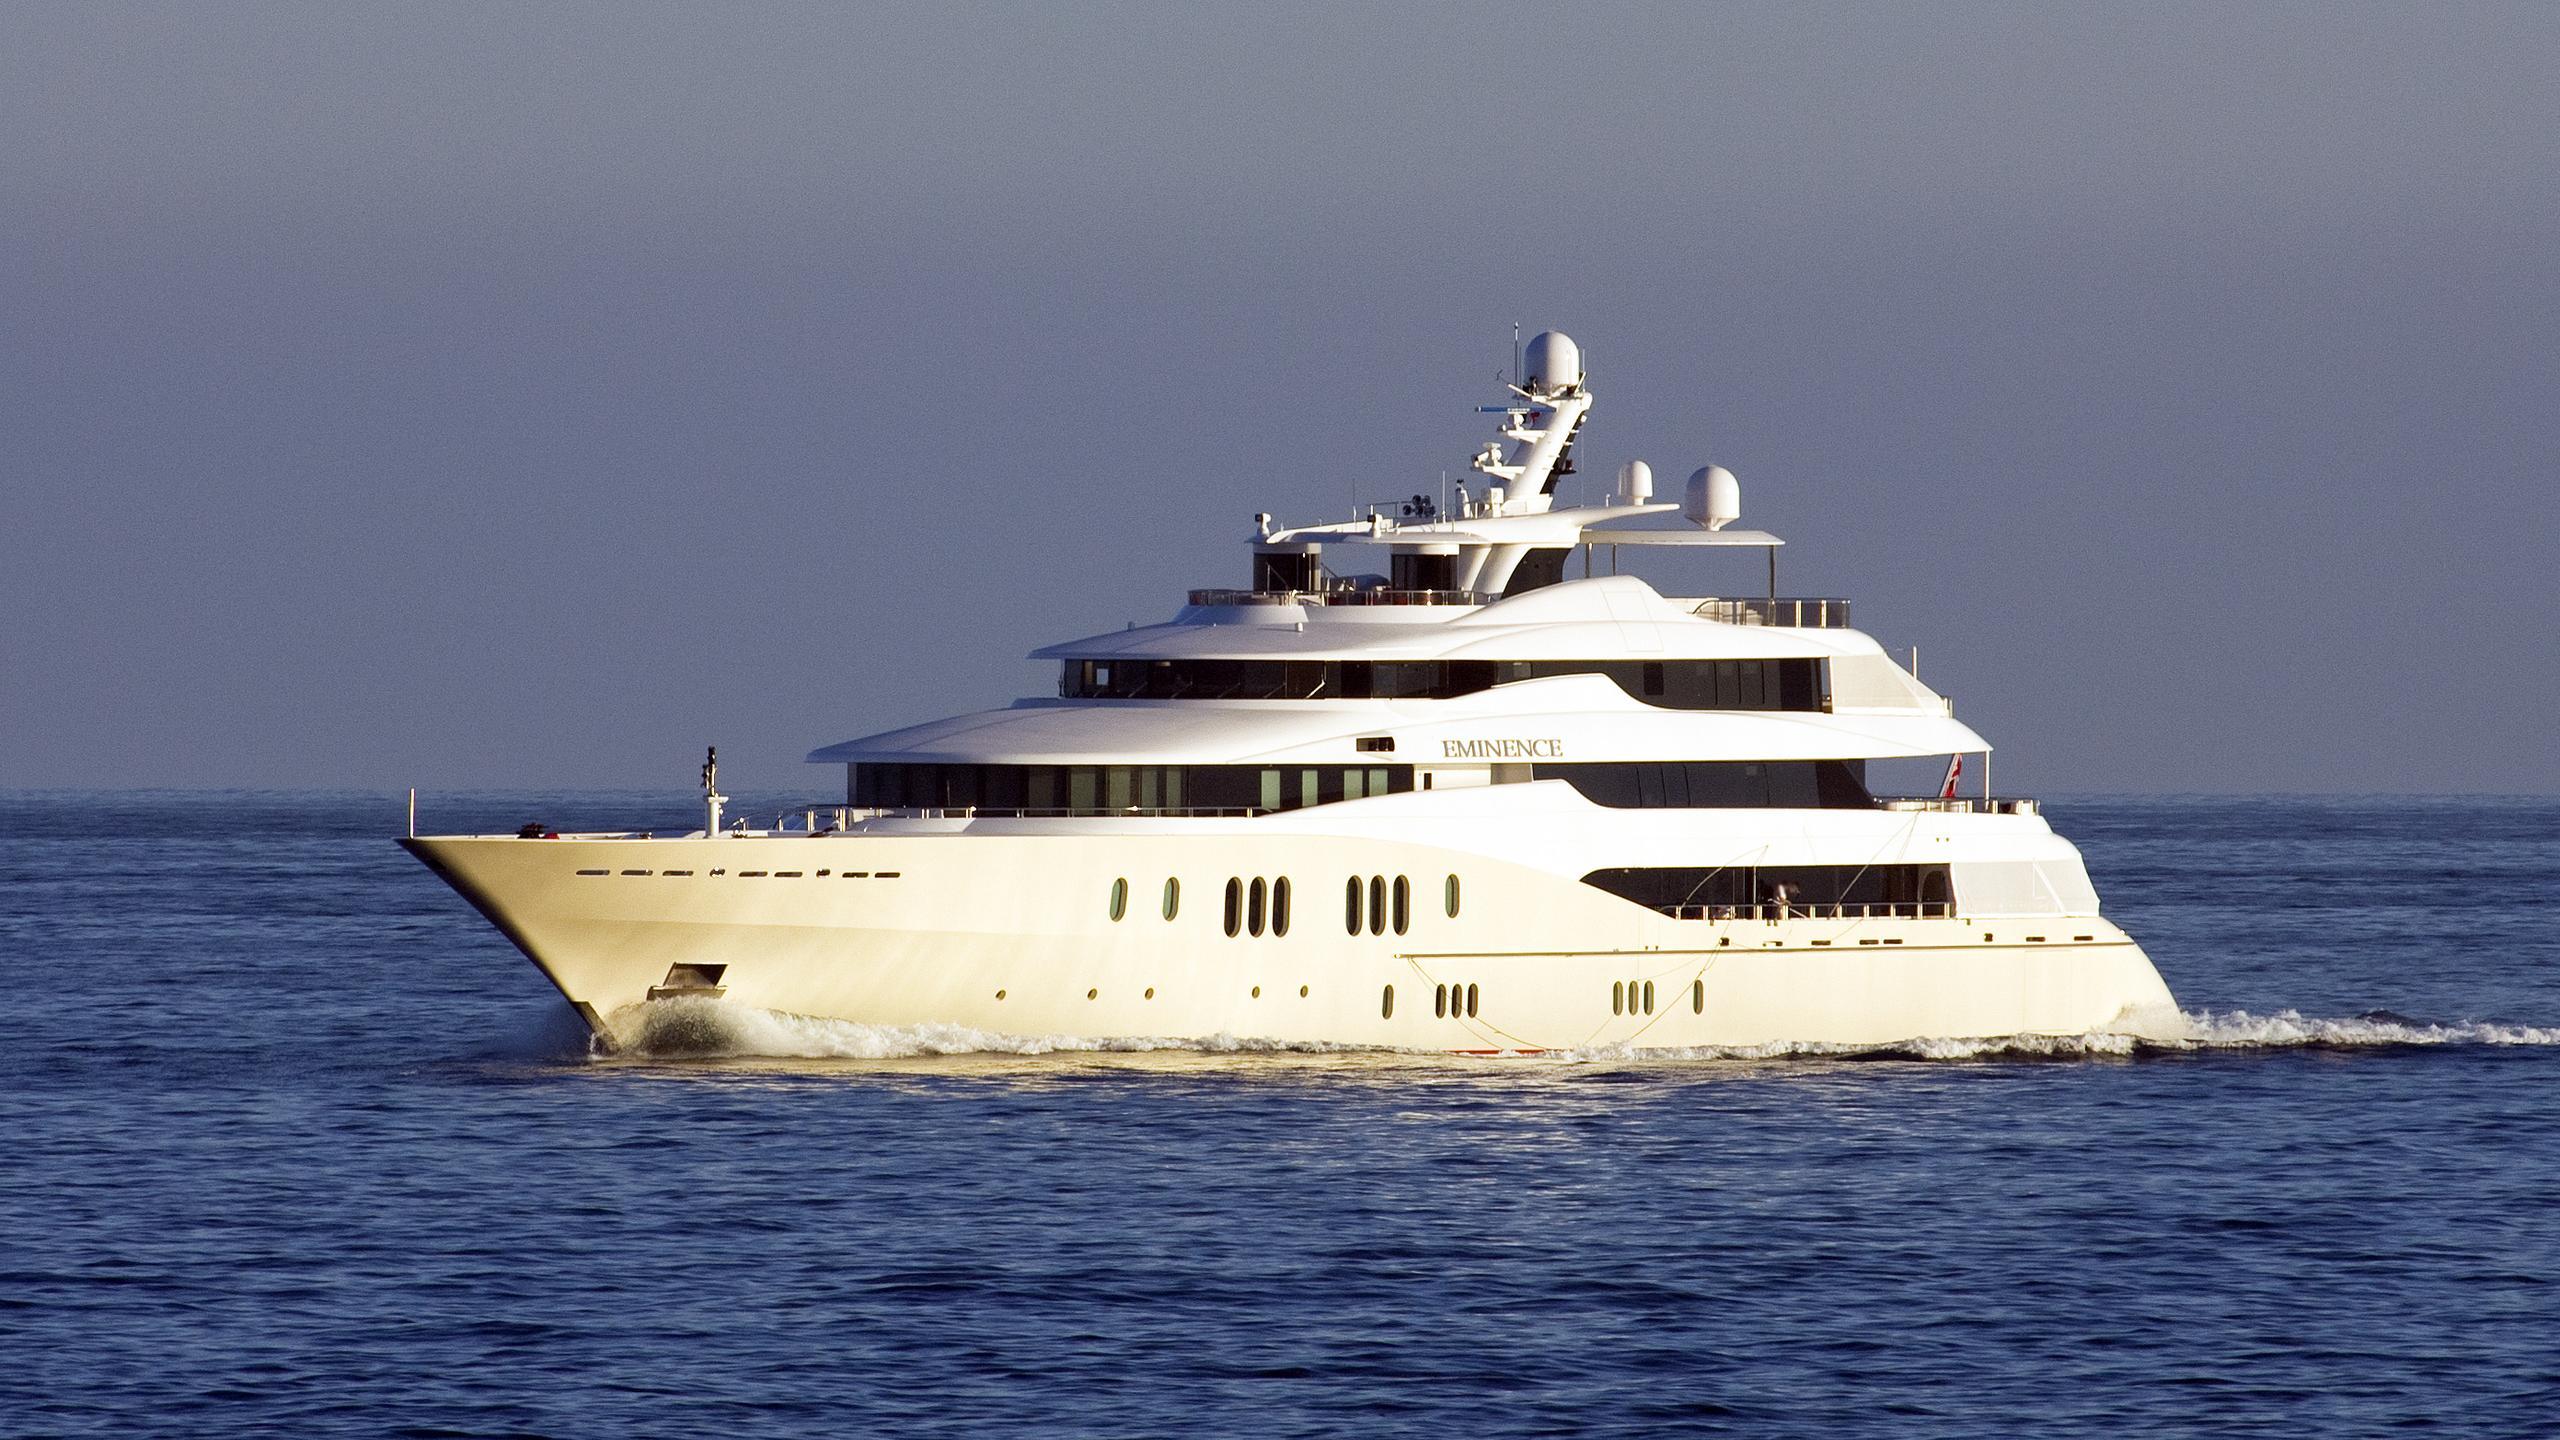 eminence-motor-yacht-abeking-rasmussen-2008-78m-cruising-half-profile.jpg eminence-motor-yacht-abeking-rasmussen-2008-78m-cruising-profile.jpg